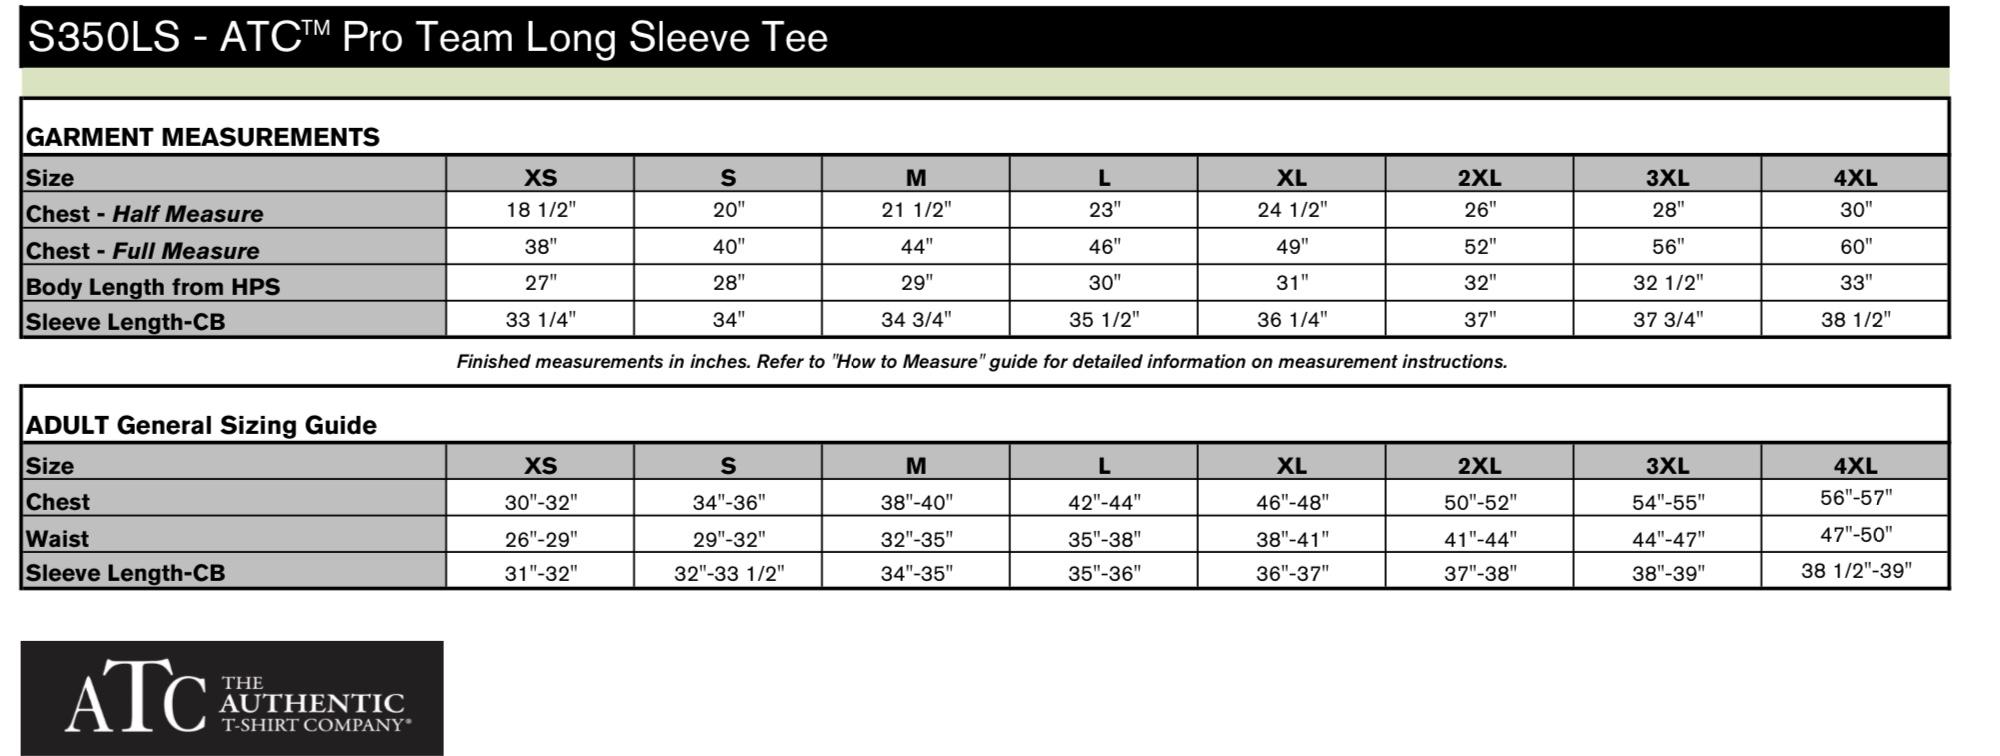 Pro Team Long Sleeve Dri-Fit Tee